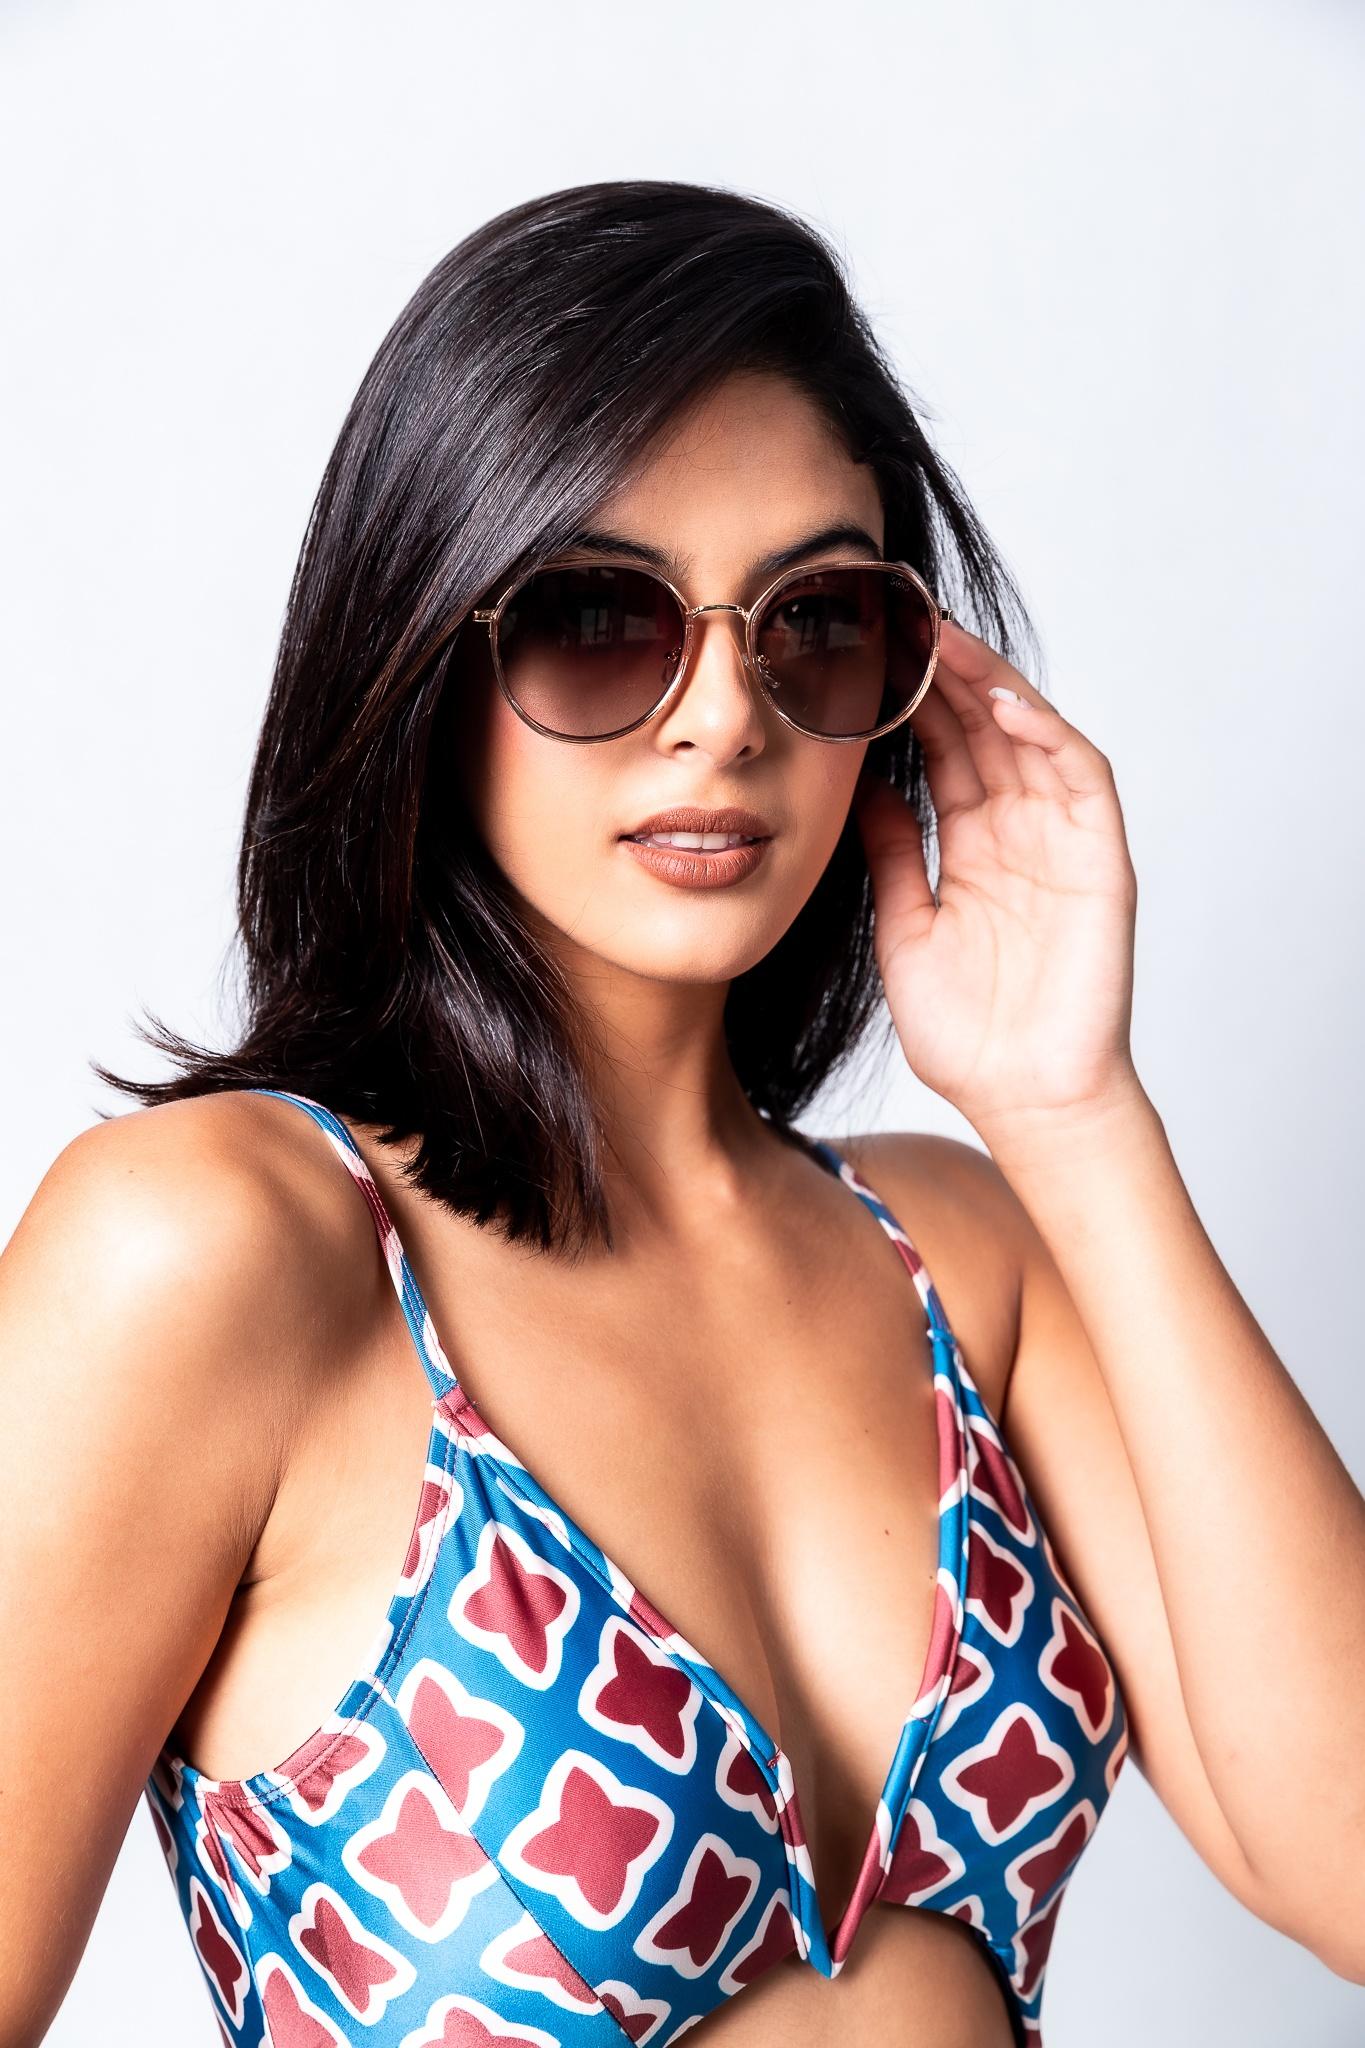 Óculos Girassol